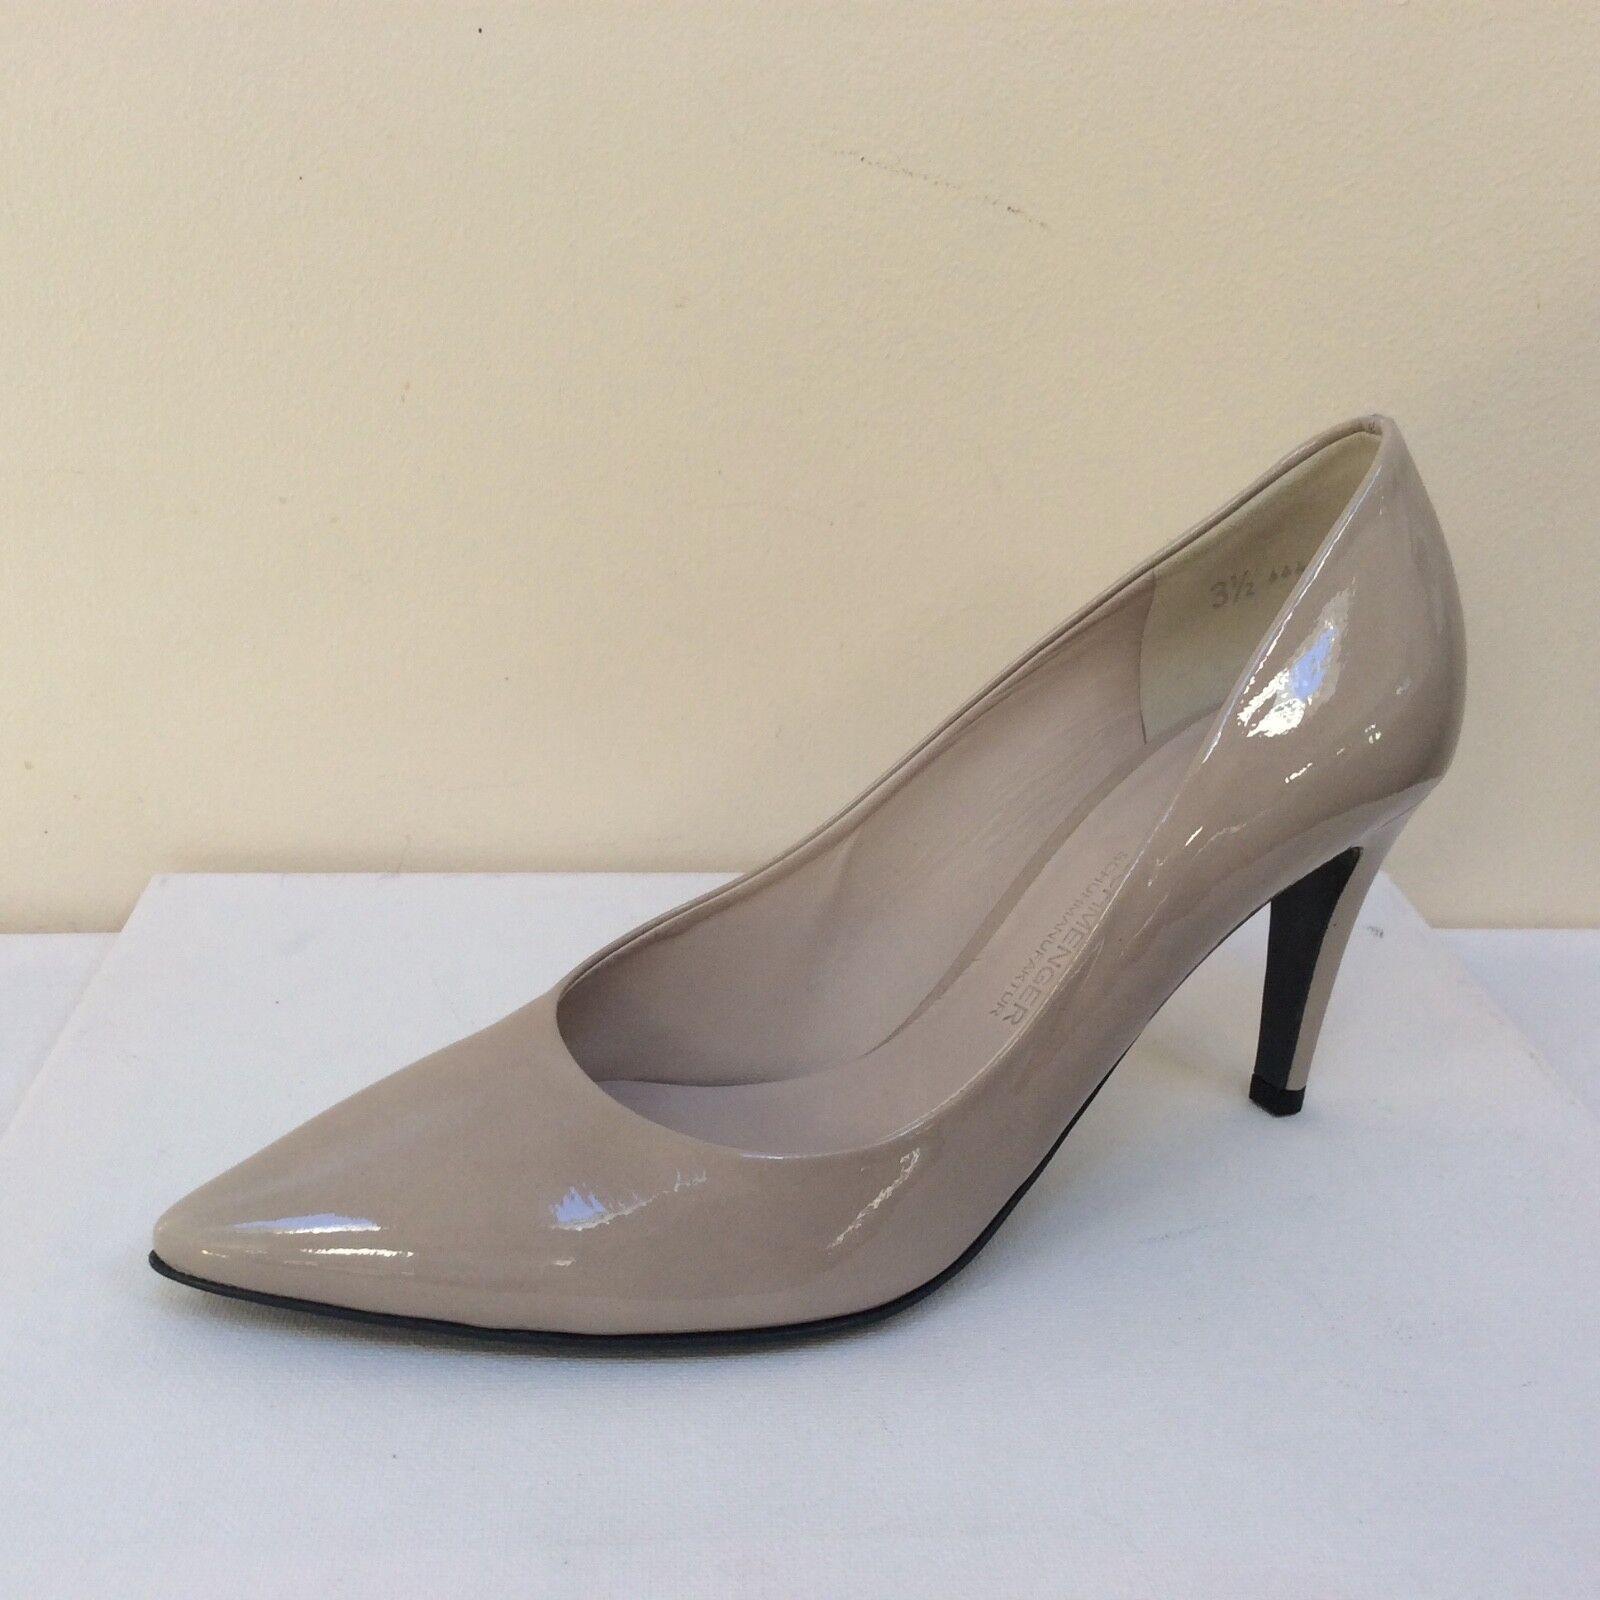 K&S shoes, Uma grey-taupe patent court shoes, K&S UK 3/EU 36,   BNWB 351225